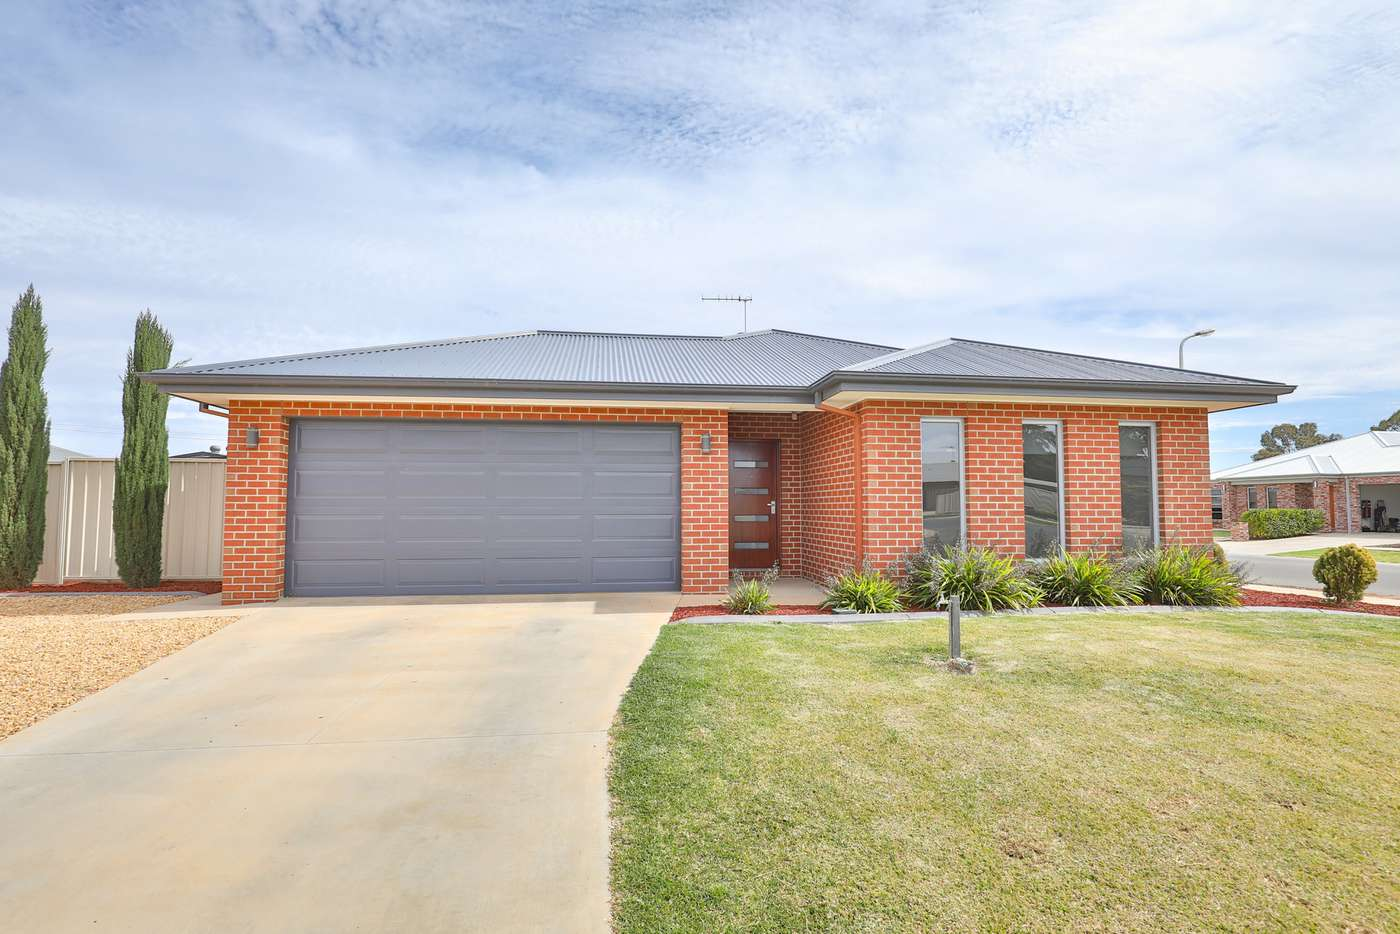 Main view of Homely house listing, 2 Karalanza Drive, Mildura VIC 3500